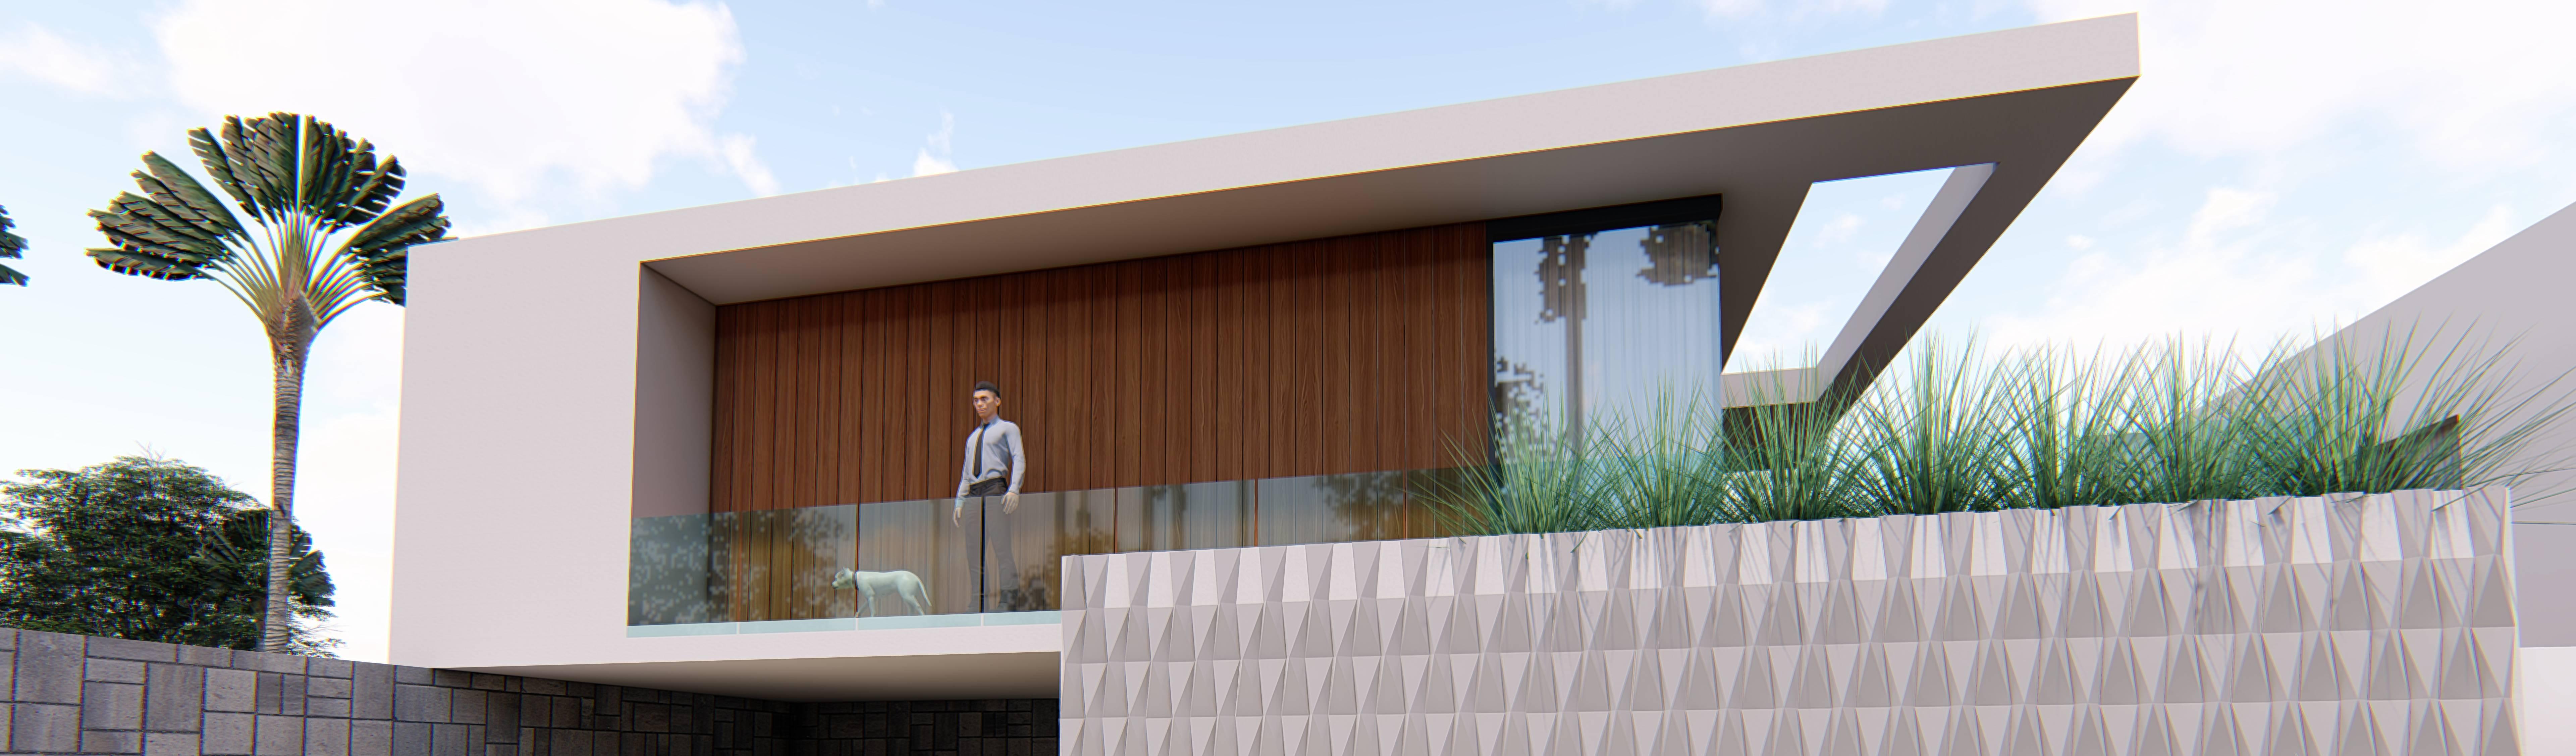 Samuel Alves Arquitetura